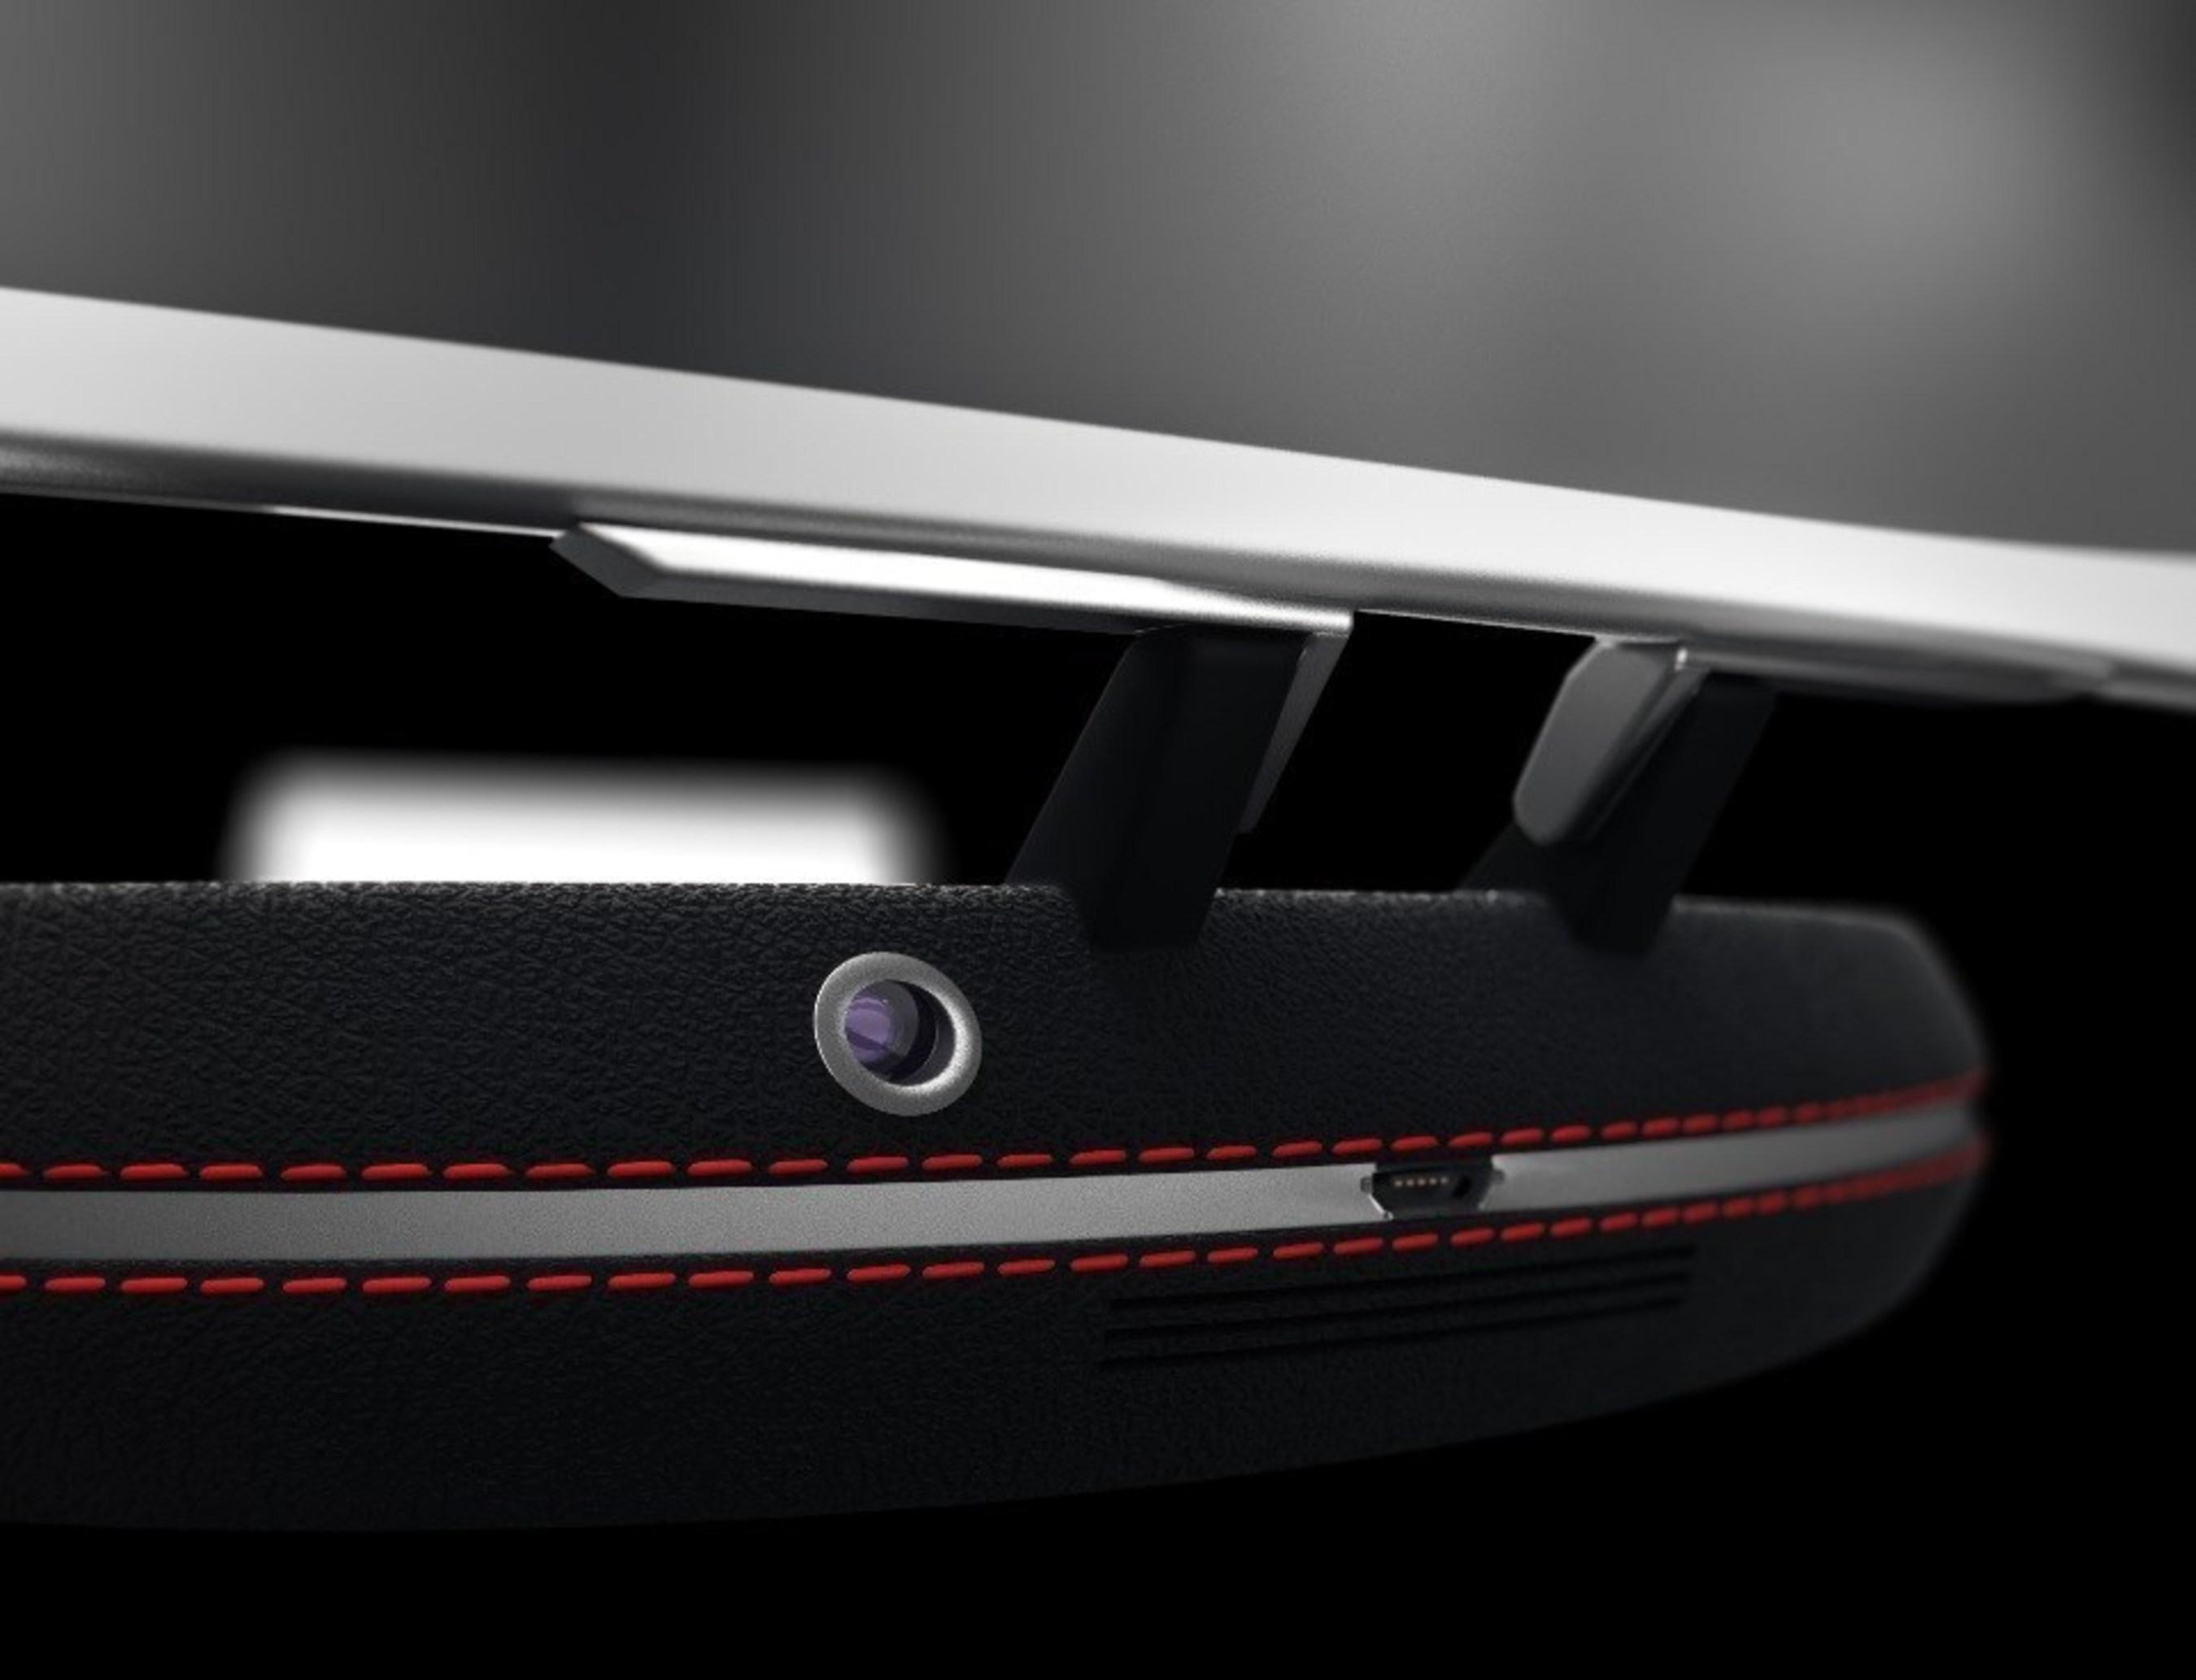 HeadsUP! Road facing camera utilizes Computer Vision